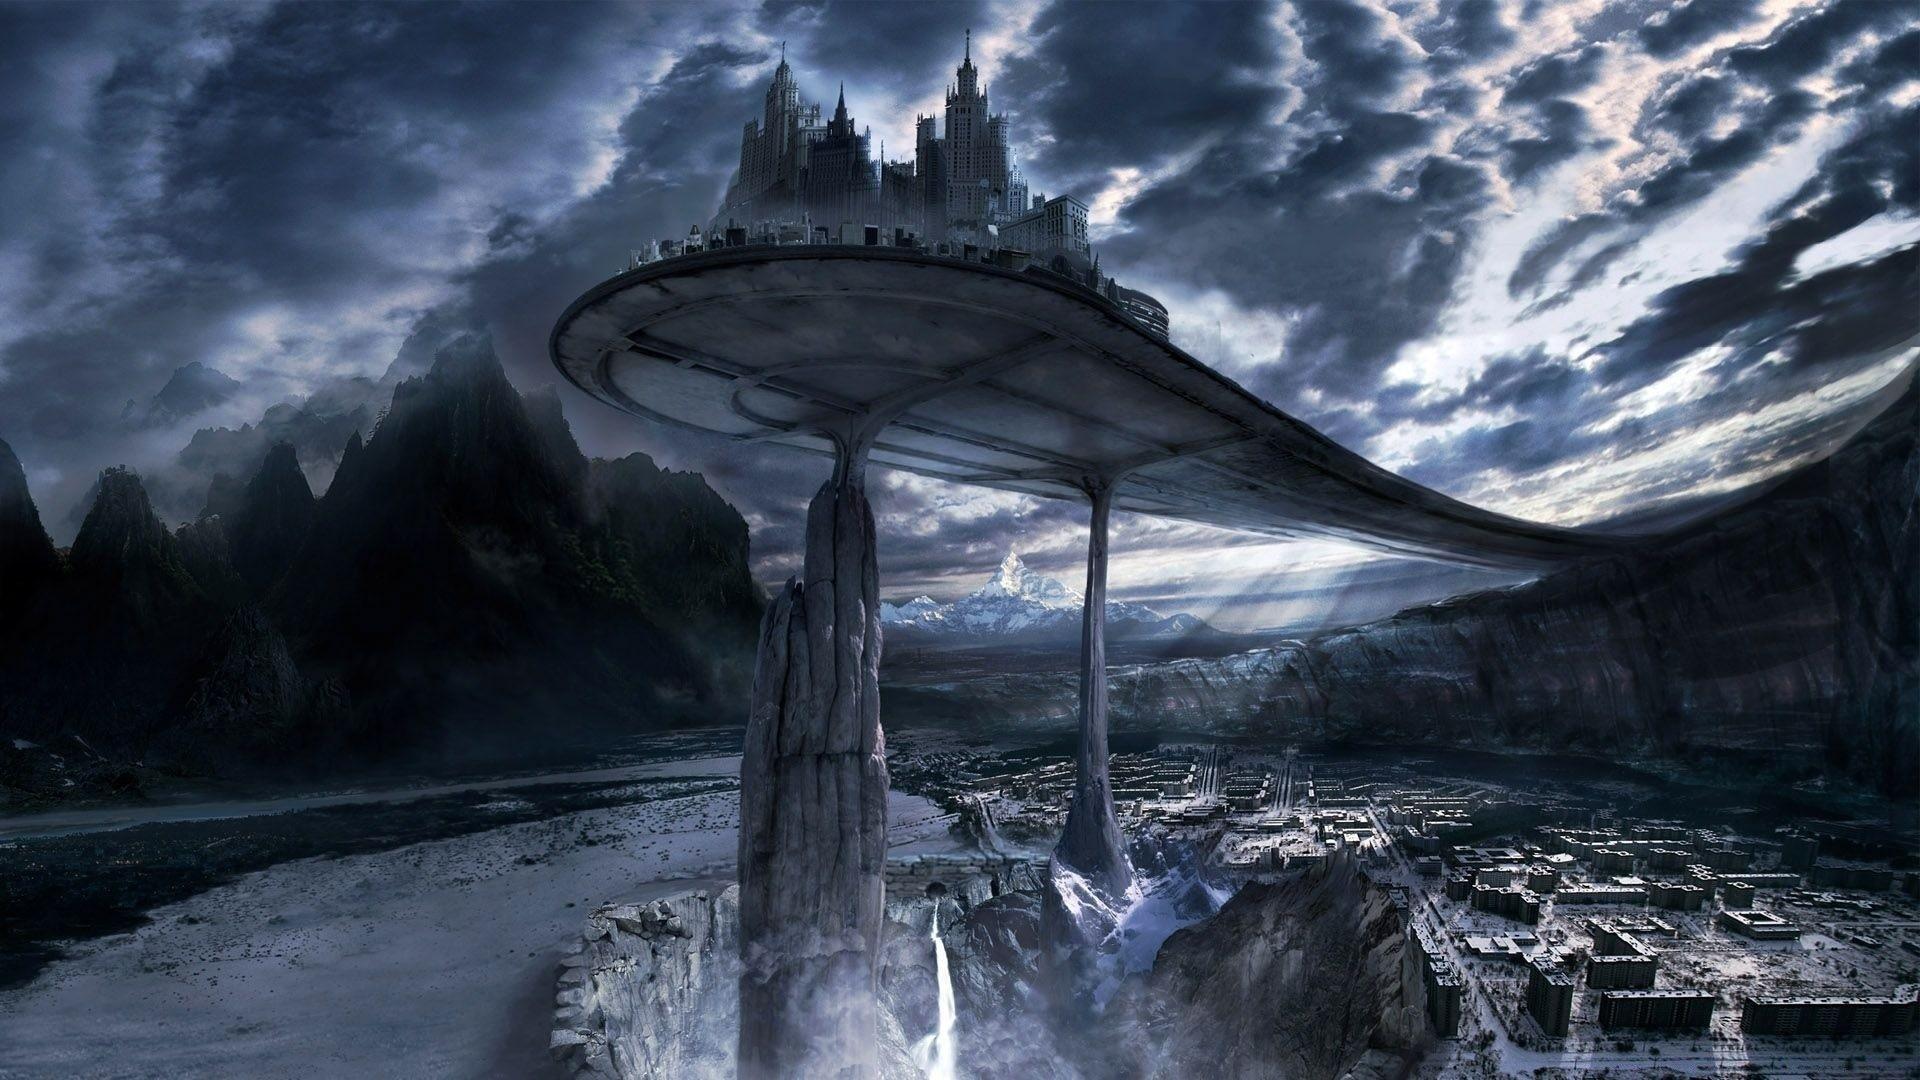 Fantasy Landsсape HD Download